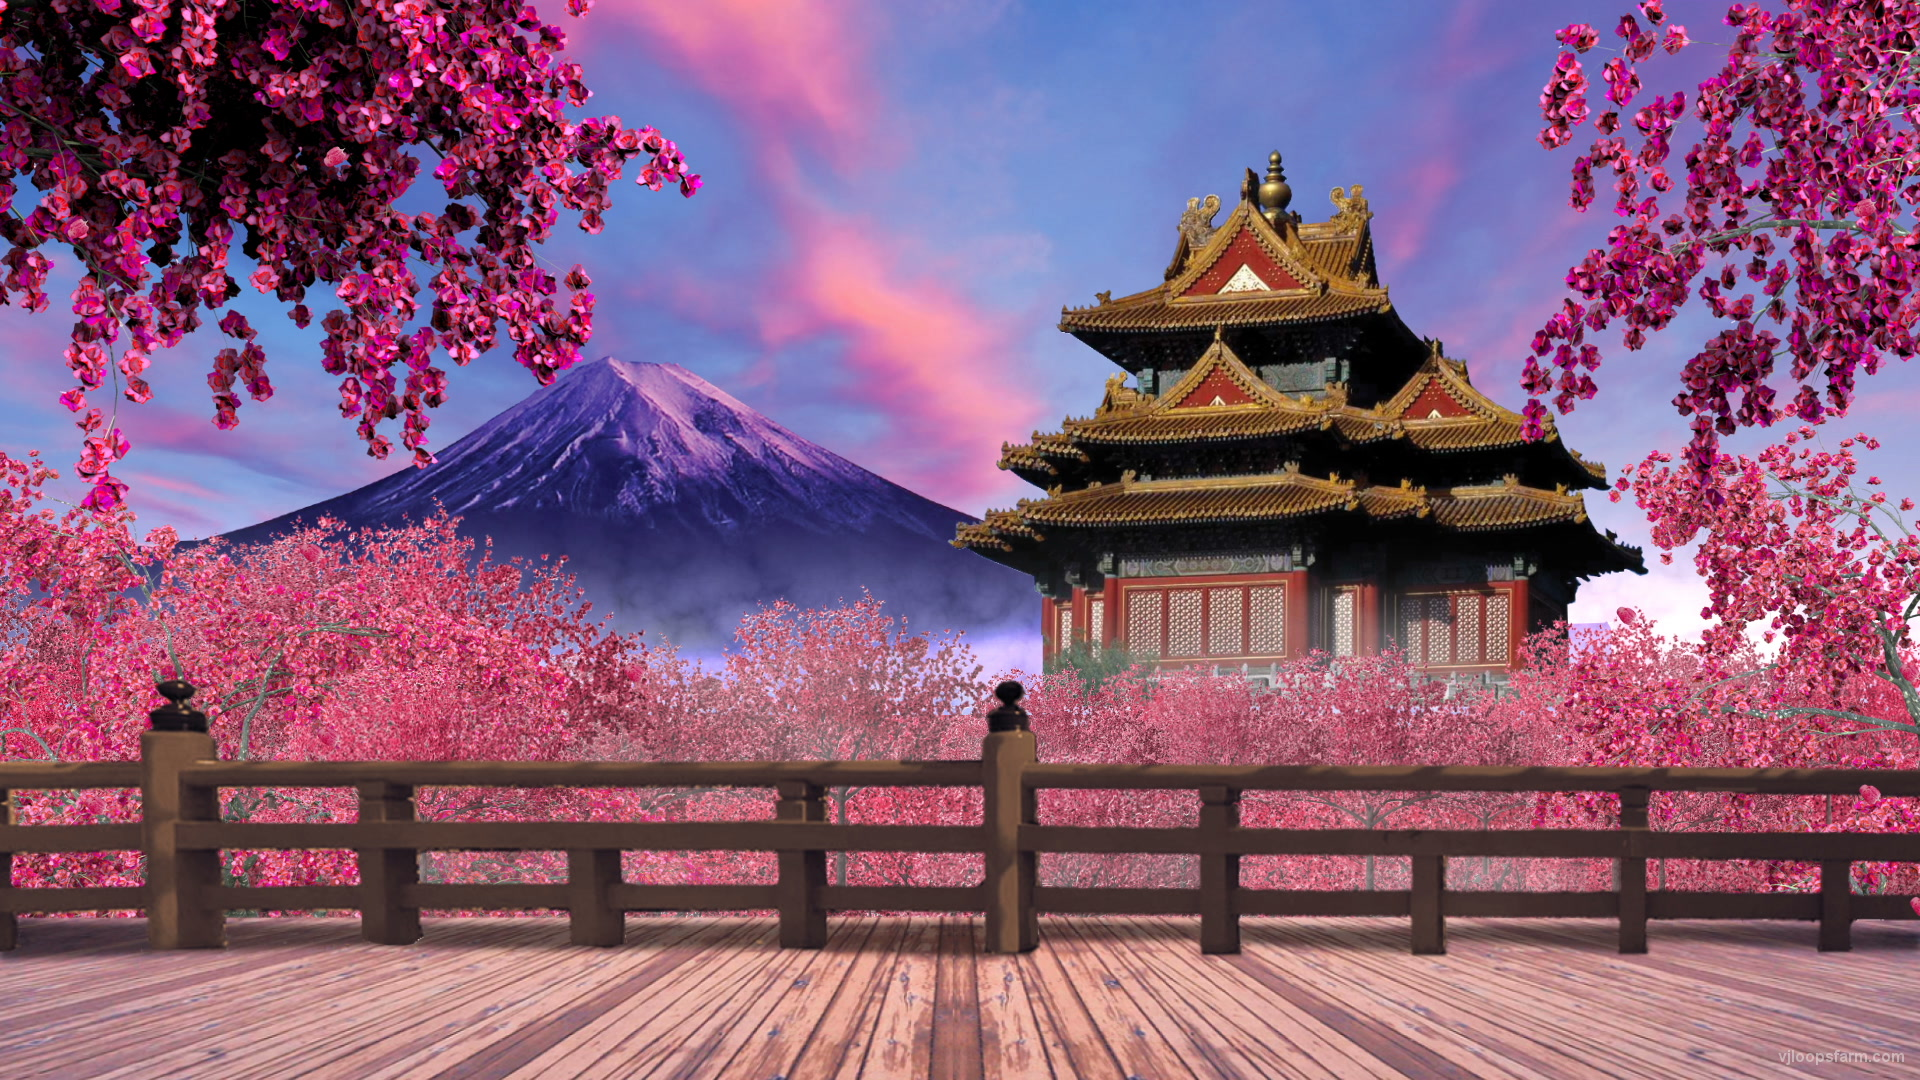 Vj Video Background Japan Pink Garden 29fps Vj Loop   The Palace 1920x1080